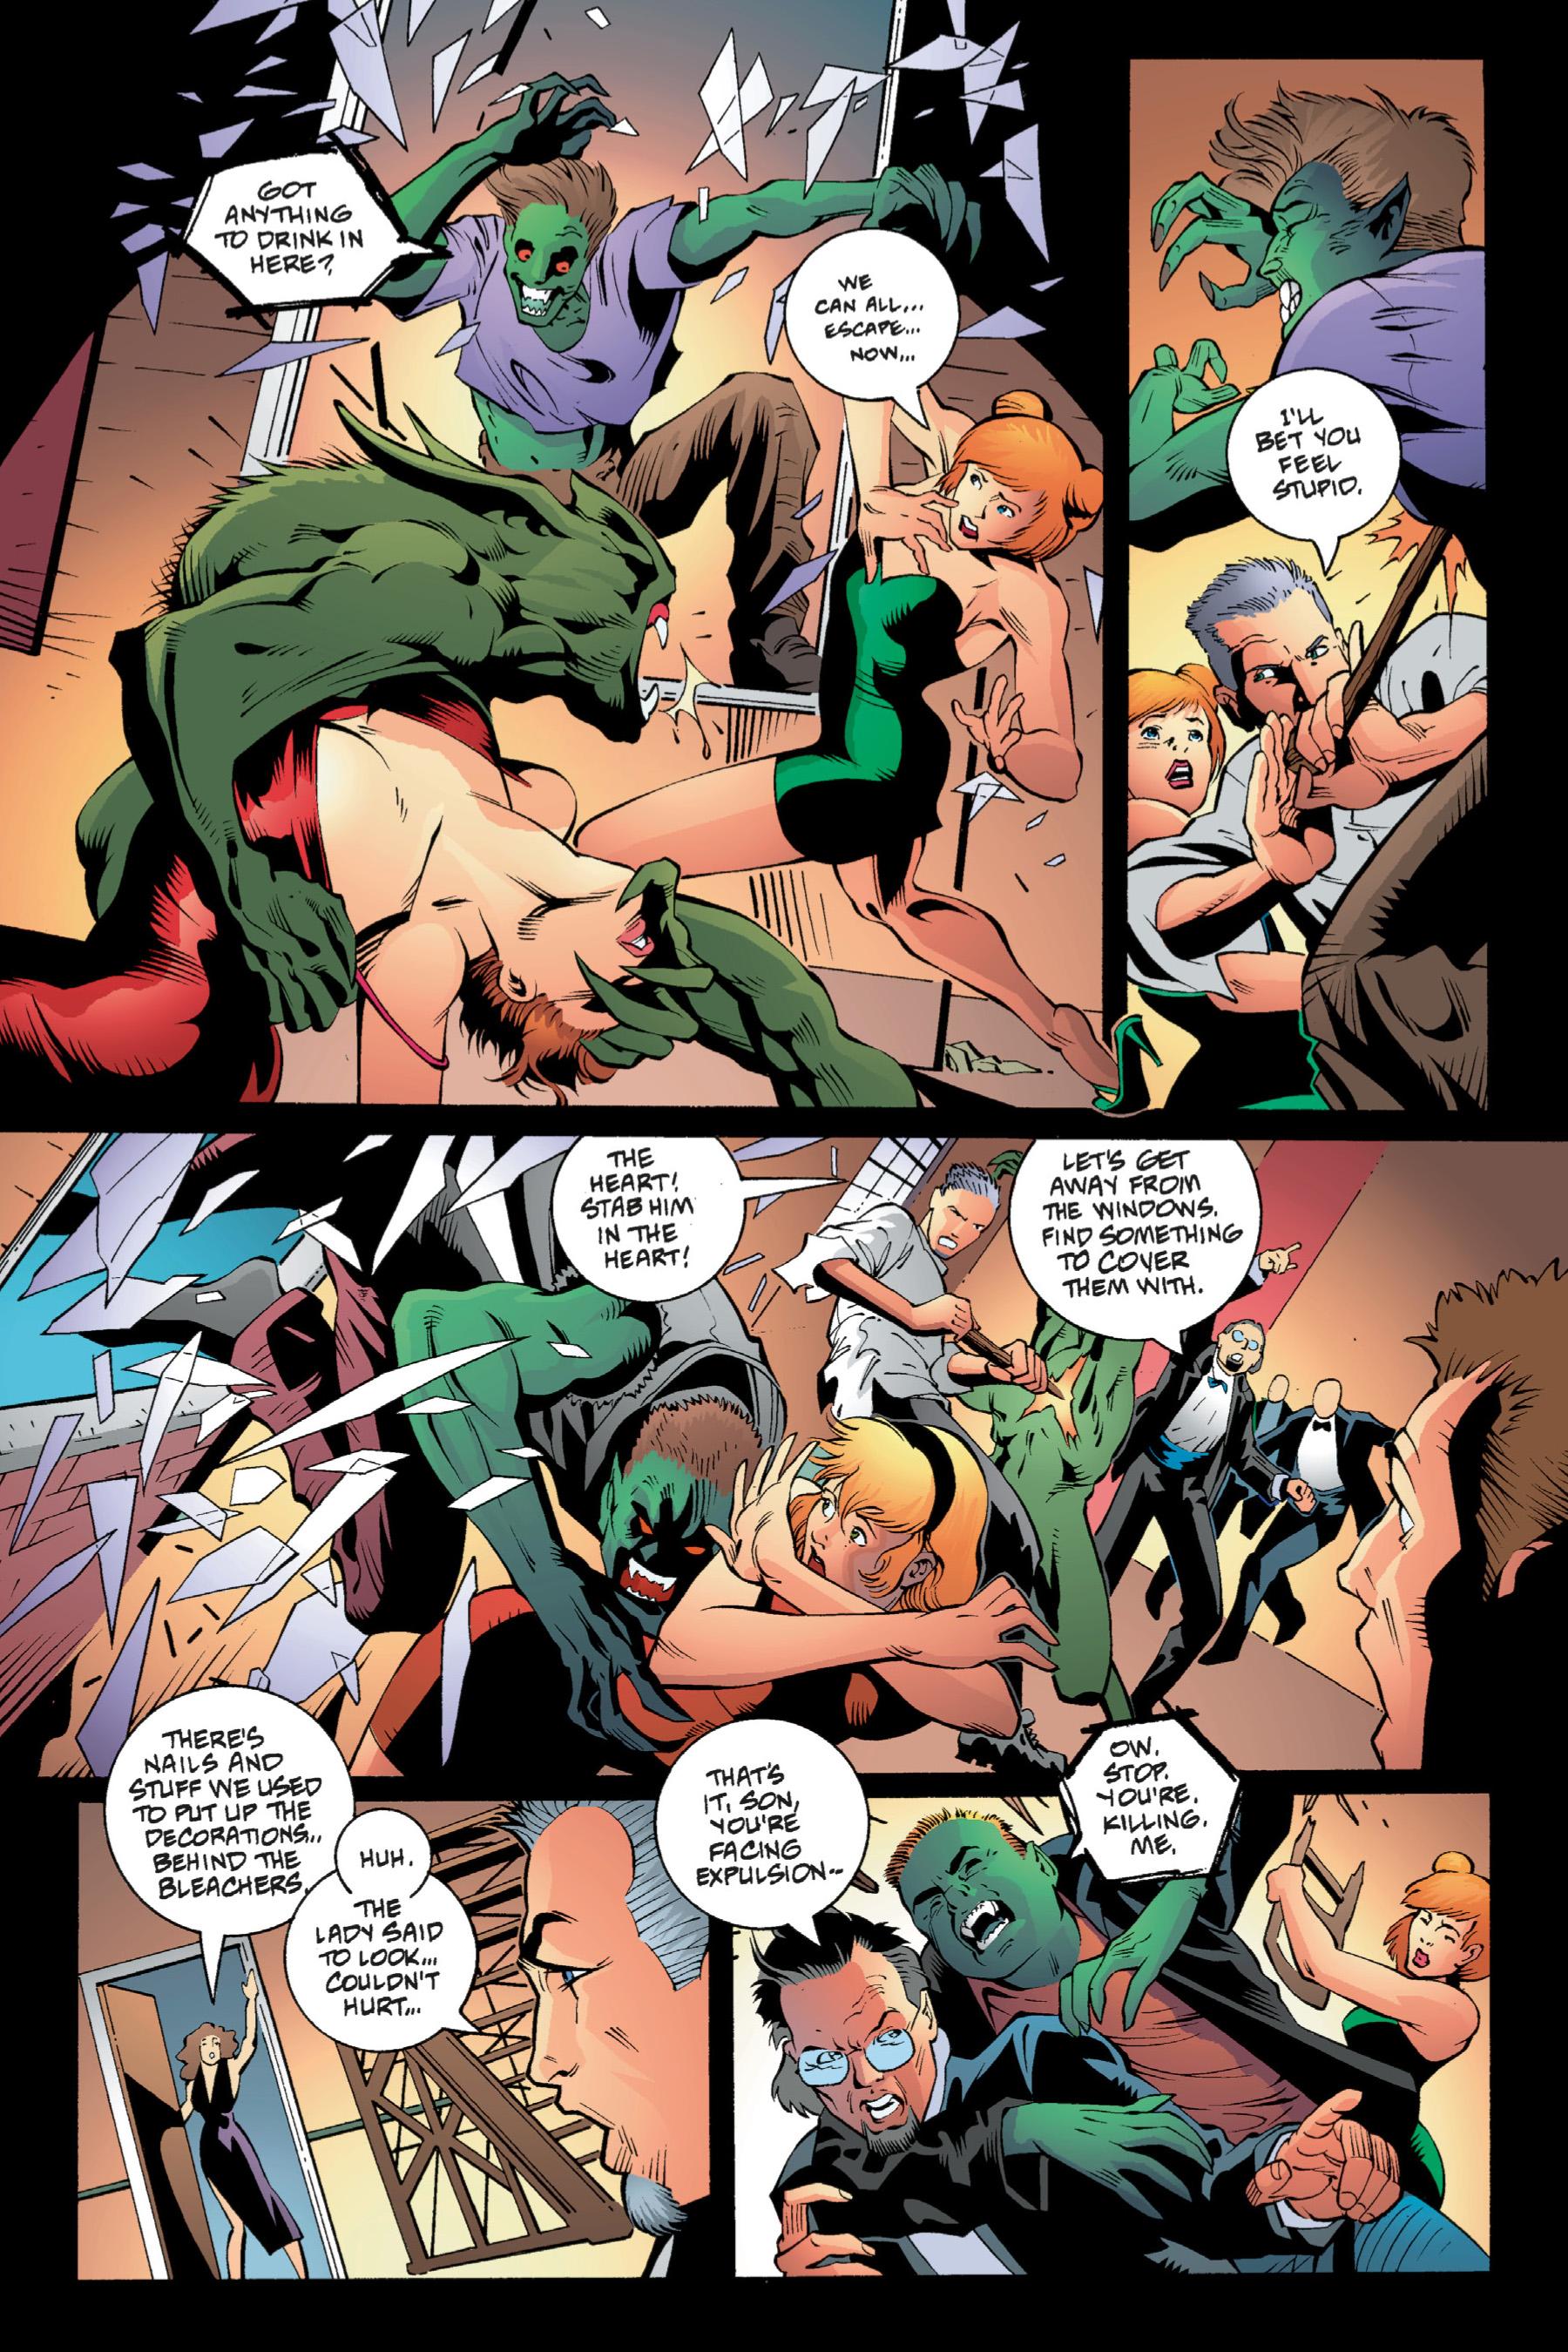 Read online Buffy the Vampire Slayer: Omnibus comic -  Issue # TPB 1 - 91